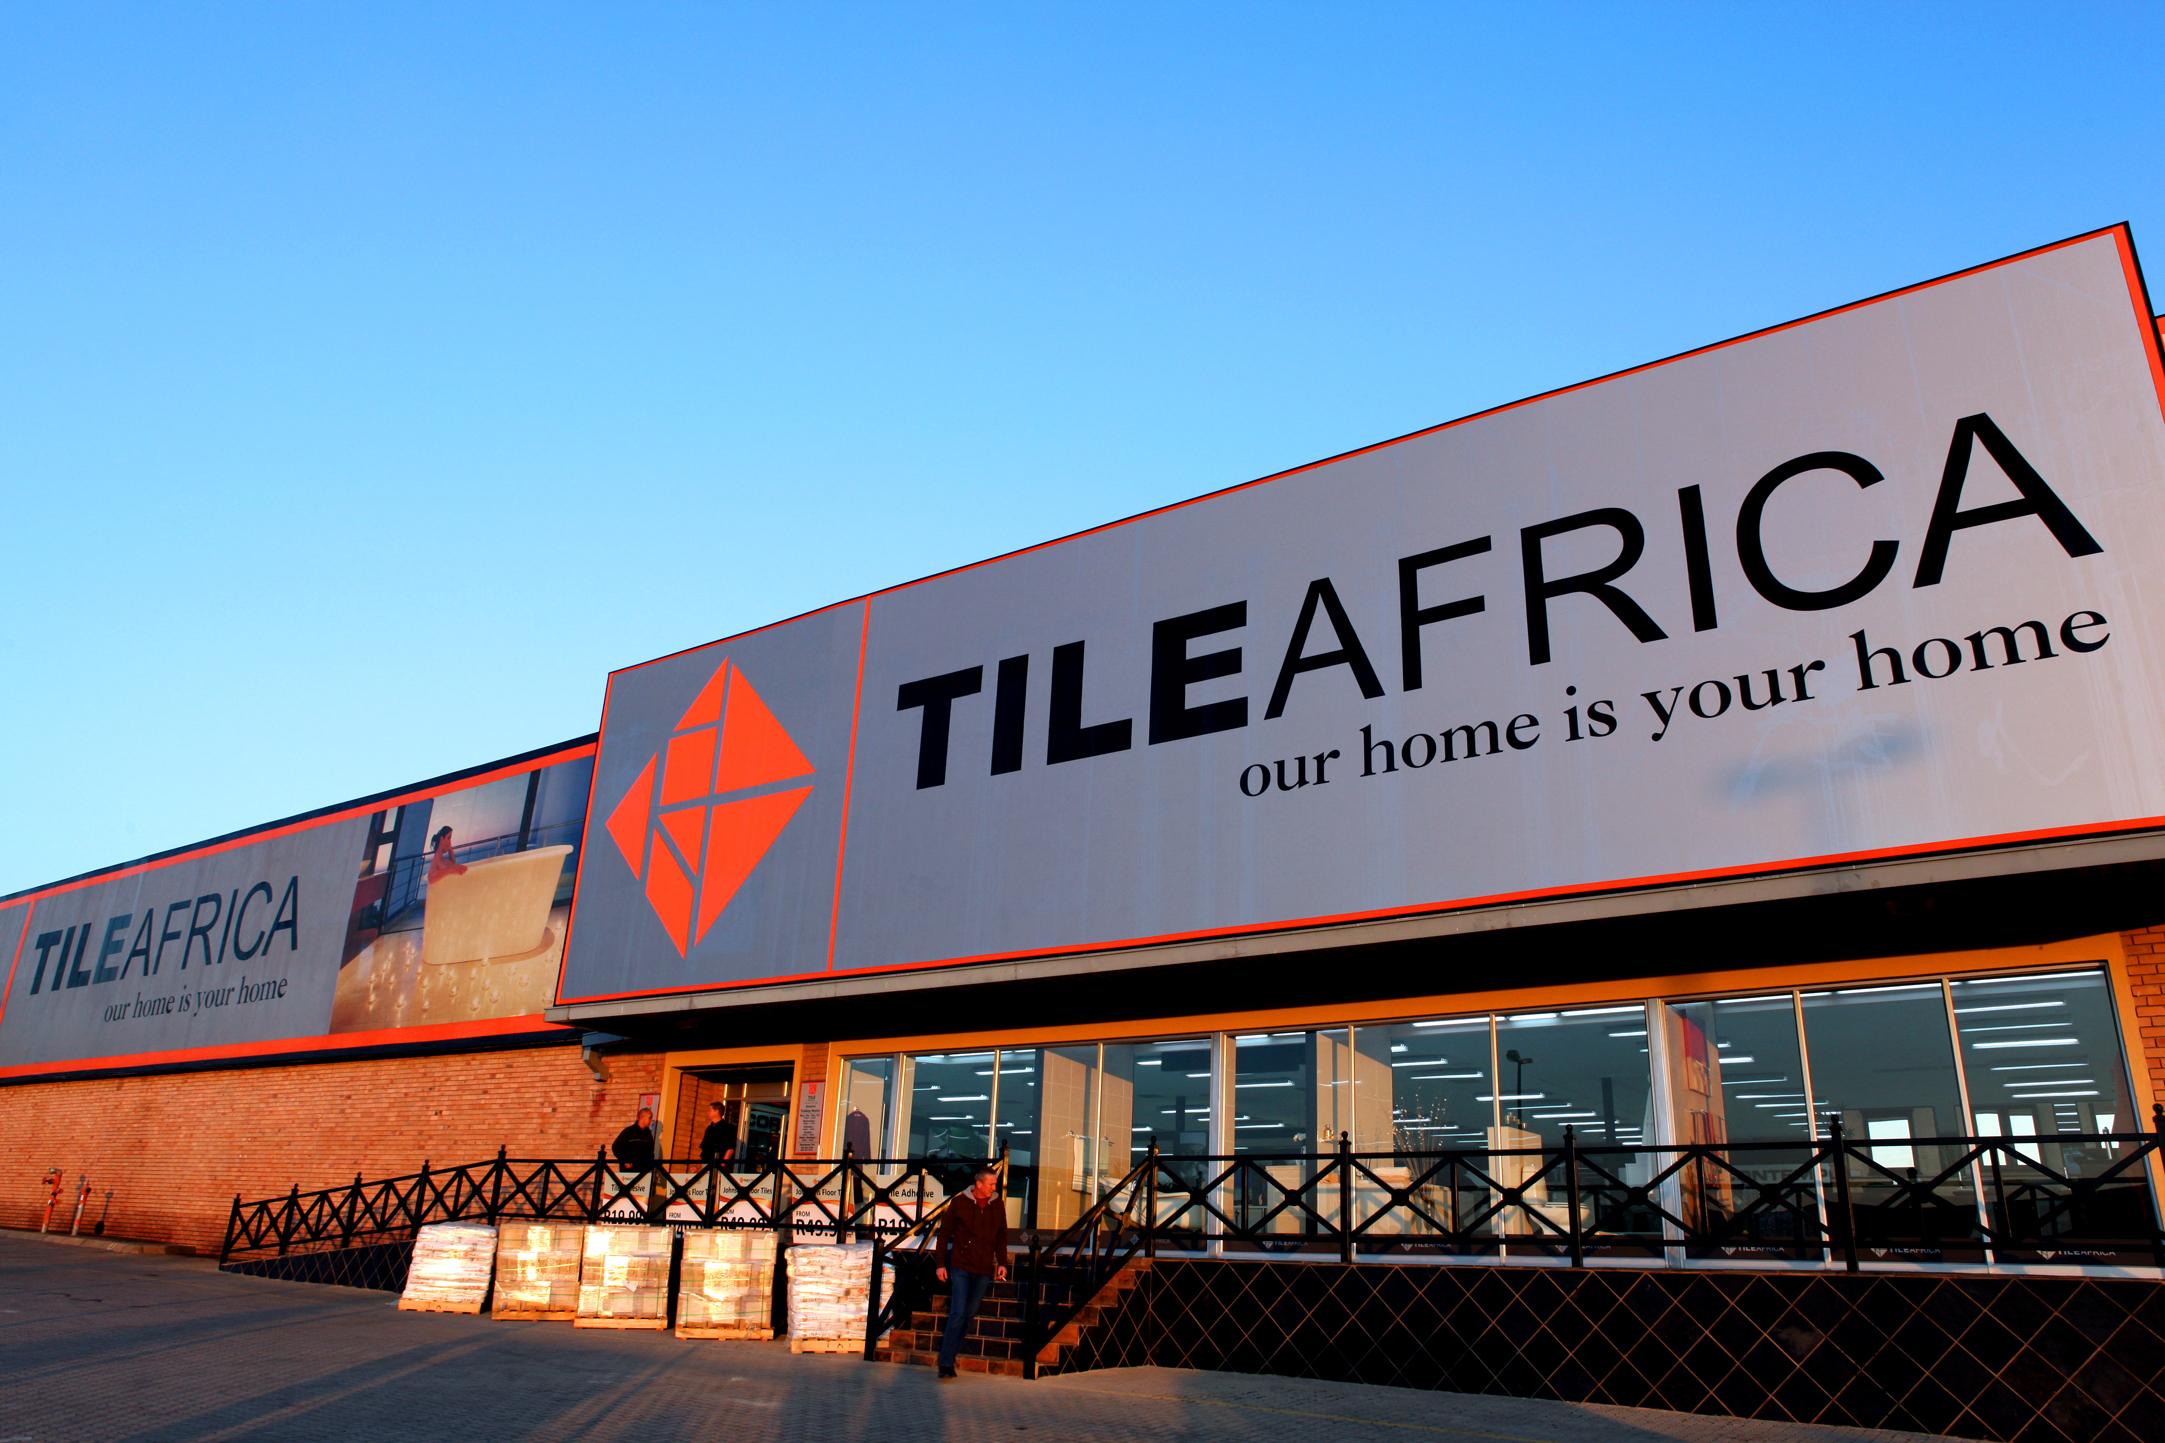 Tile Africa Nelspruit